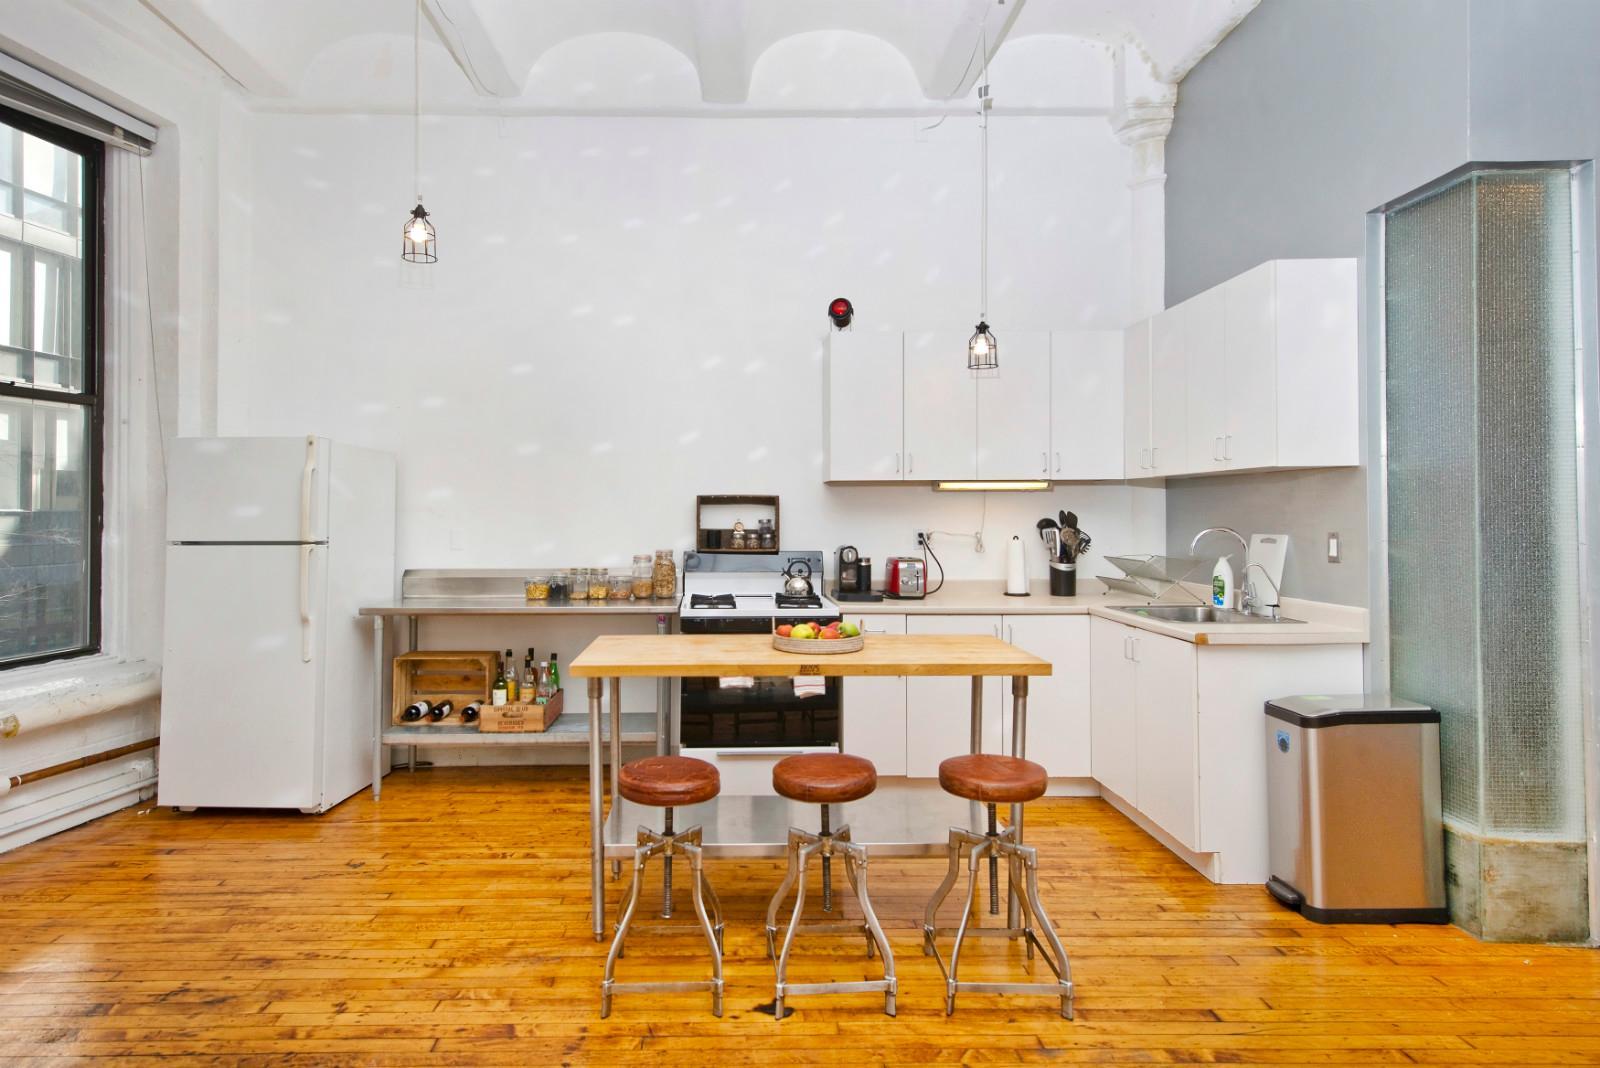 49 Bleecker Street , lofts, Noho, Short term rental, Loft rental, cool listings